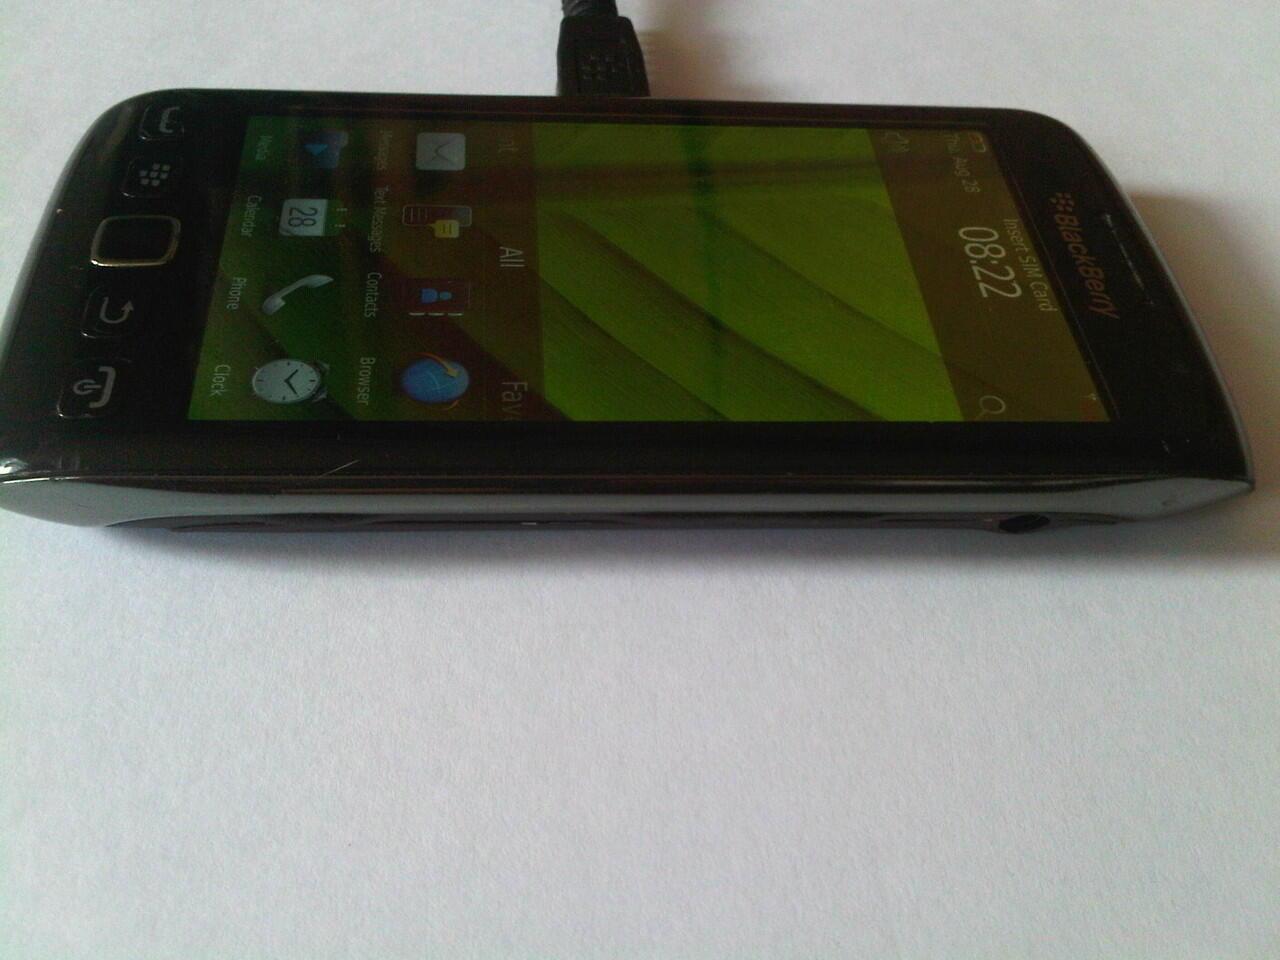 [WTS] Blackberry Torch 9860 (Monza) batangan